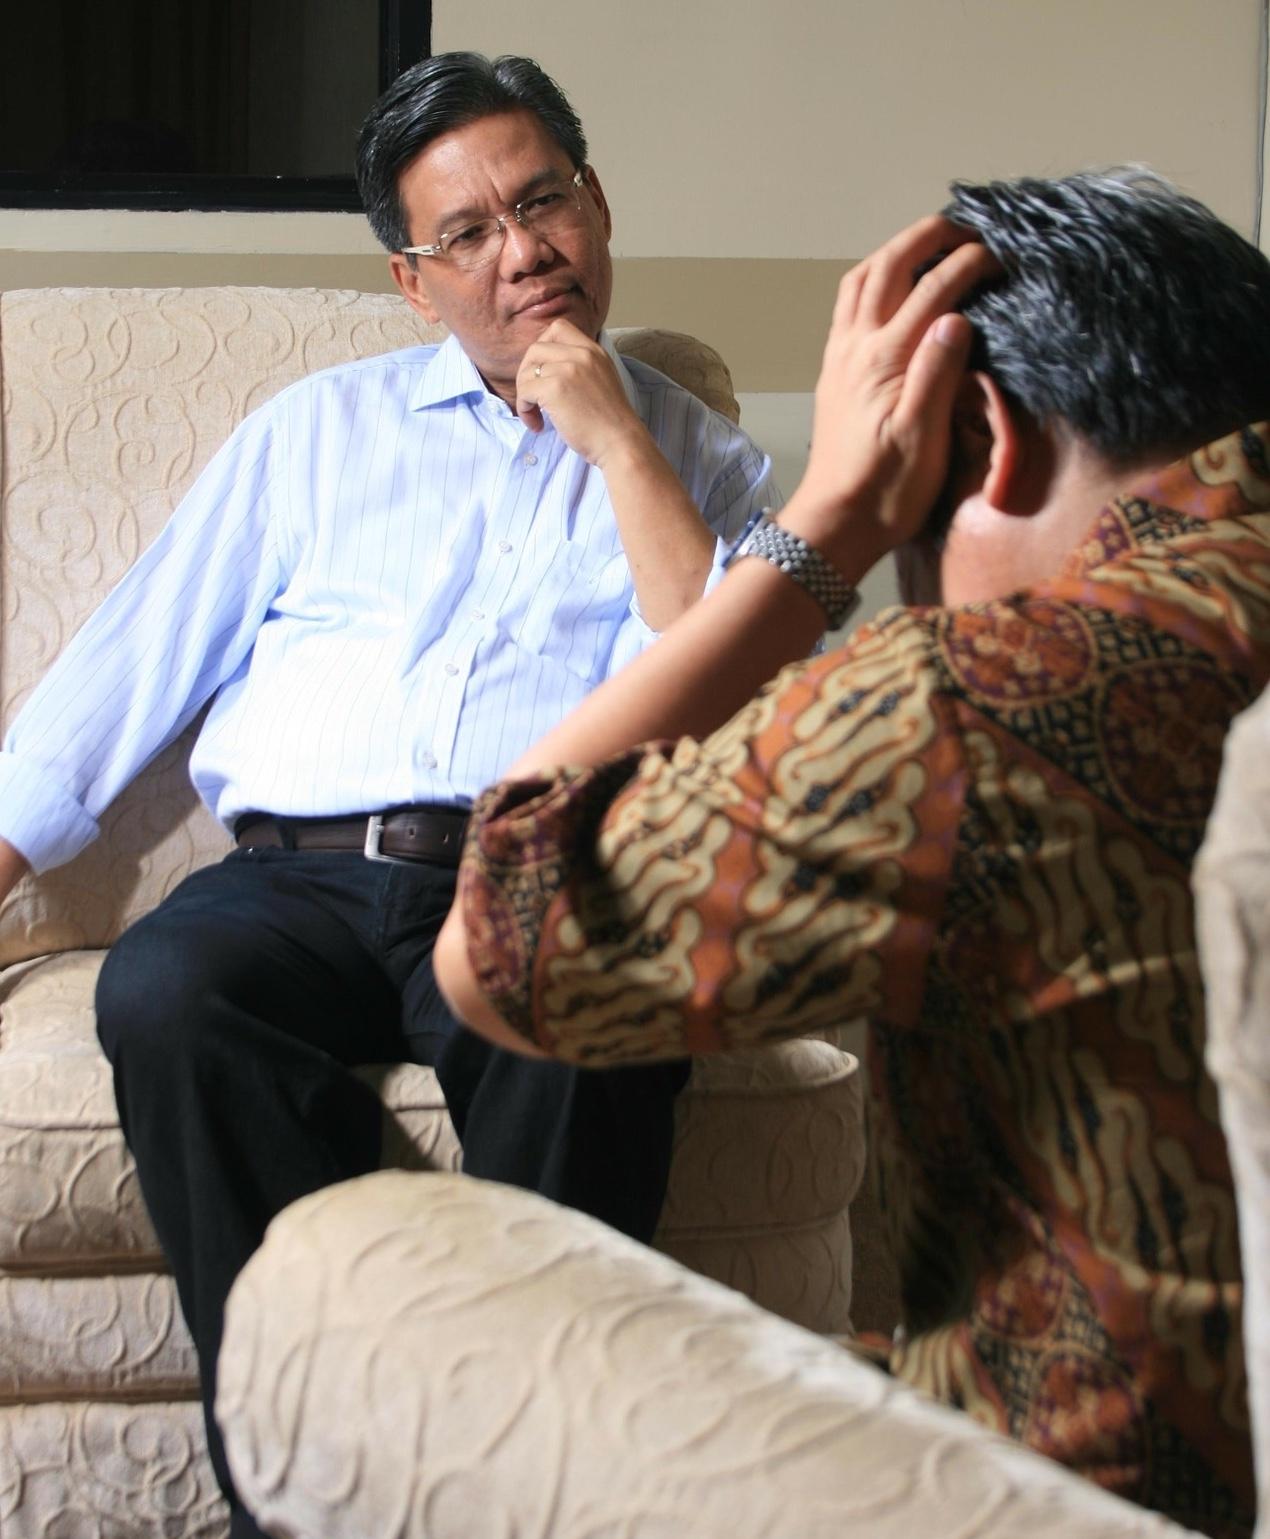 counseling-99740_1920_tiyowprasetyo